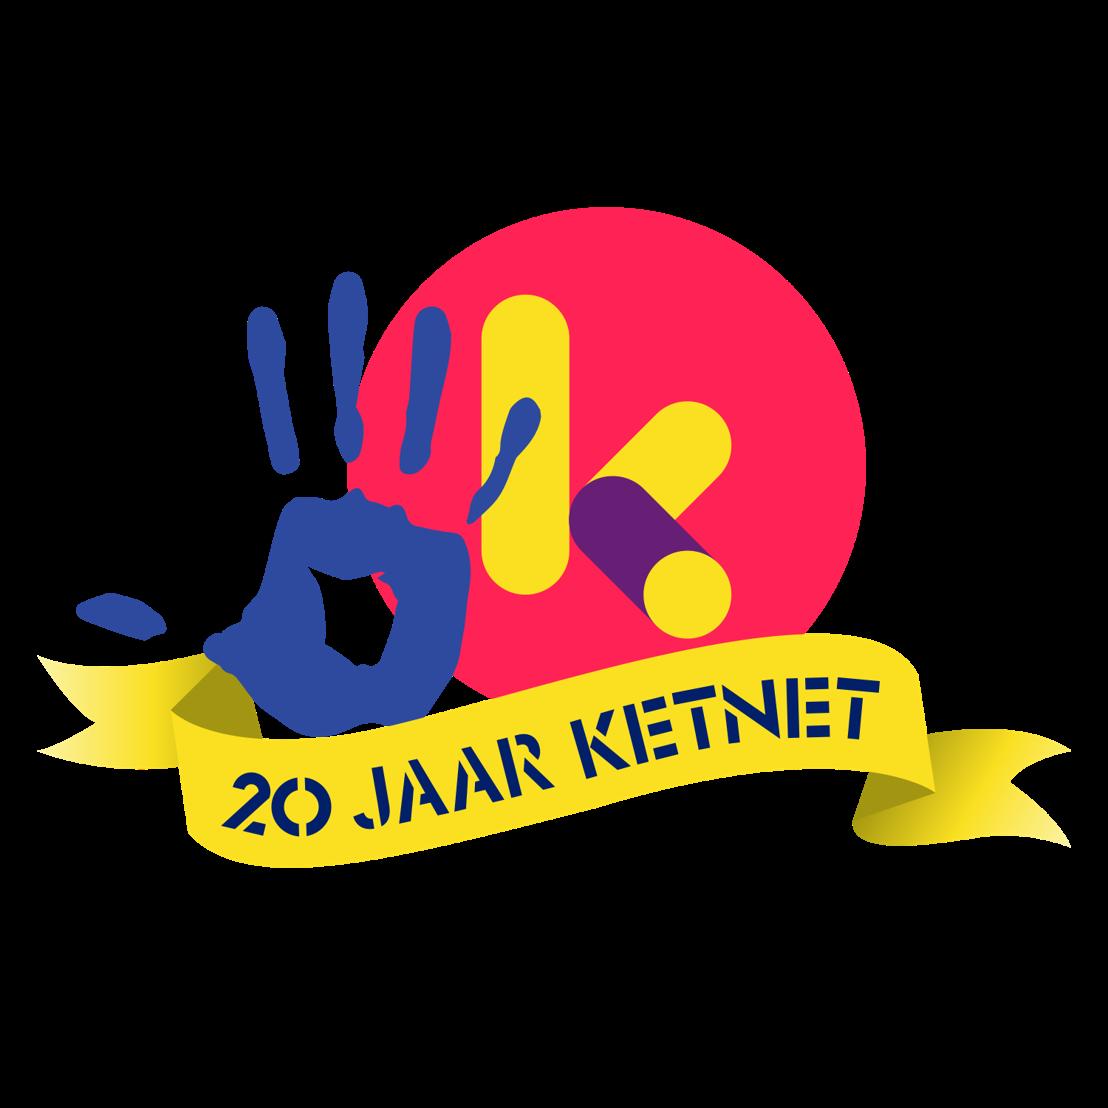 Logo 20 jaar Ketnet